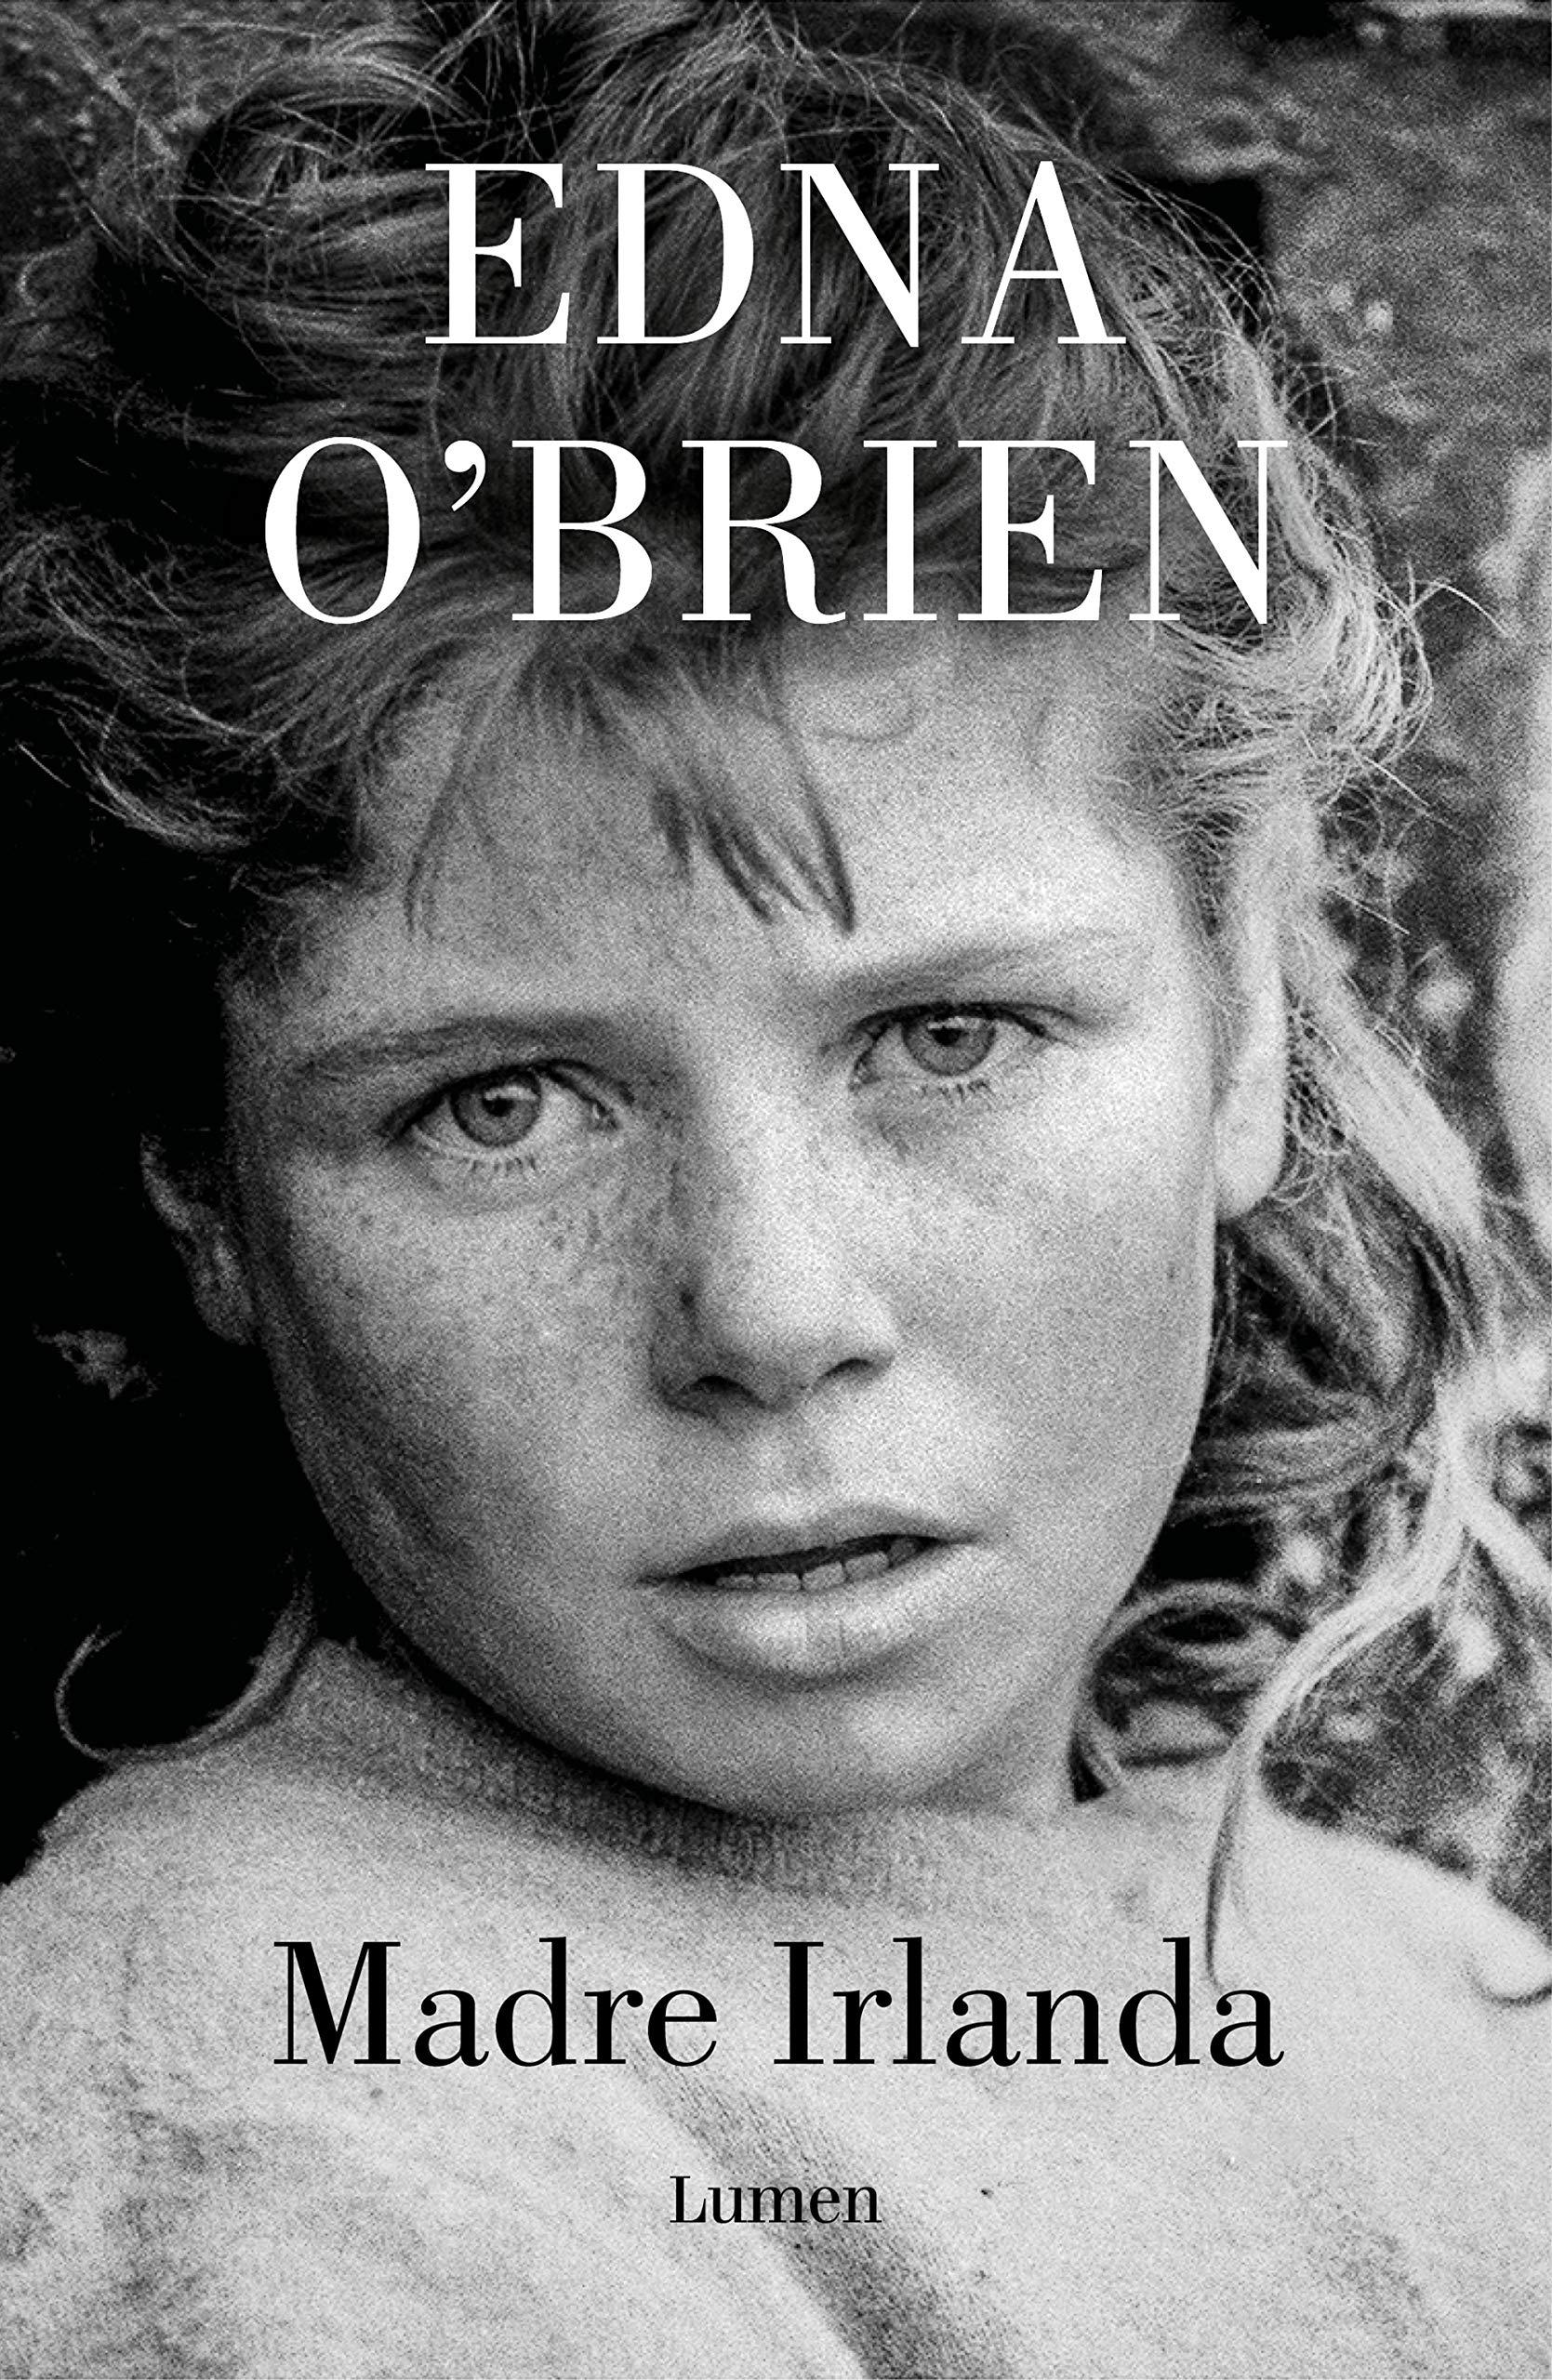 Madre Irlanda (Narrativa) (Spanish Edition): O'Brien, Edna, Bourke, Fergus, López Muñoz, Mercedes Regina: 9788426408433: Amazon.com: Books